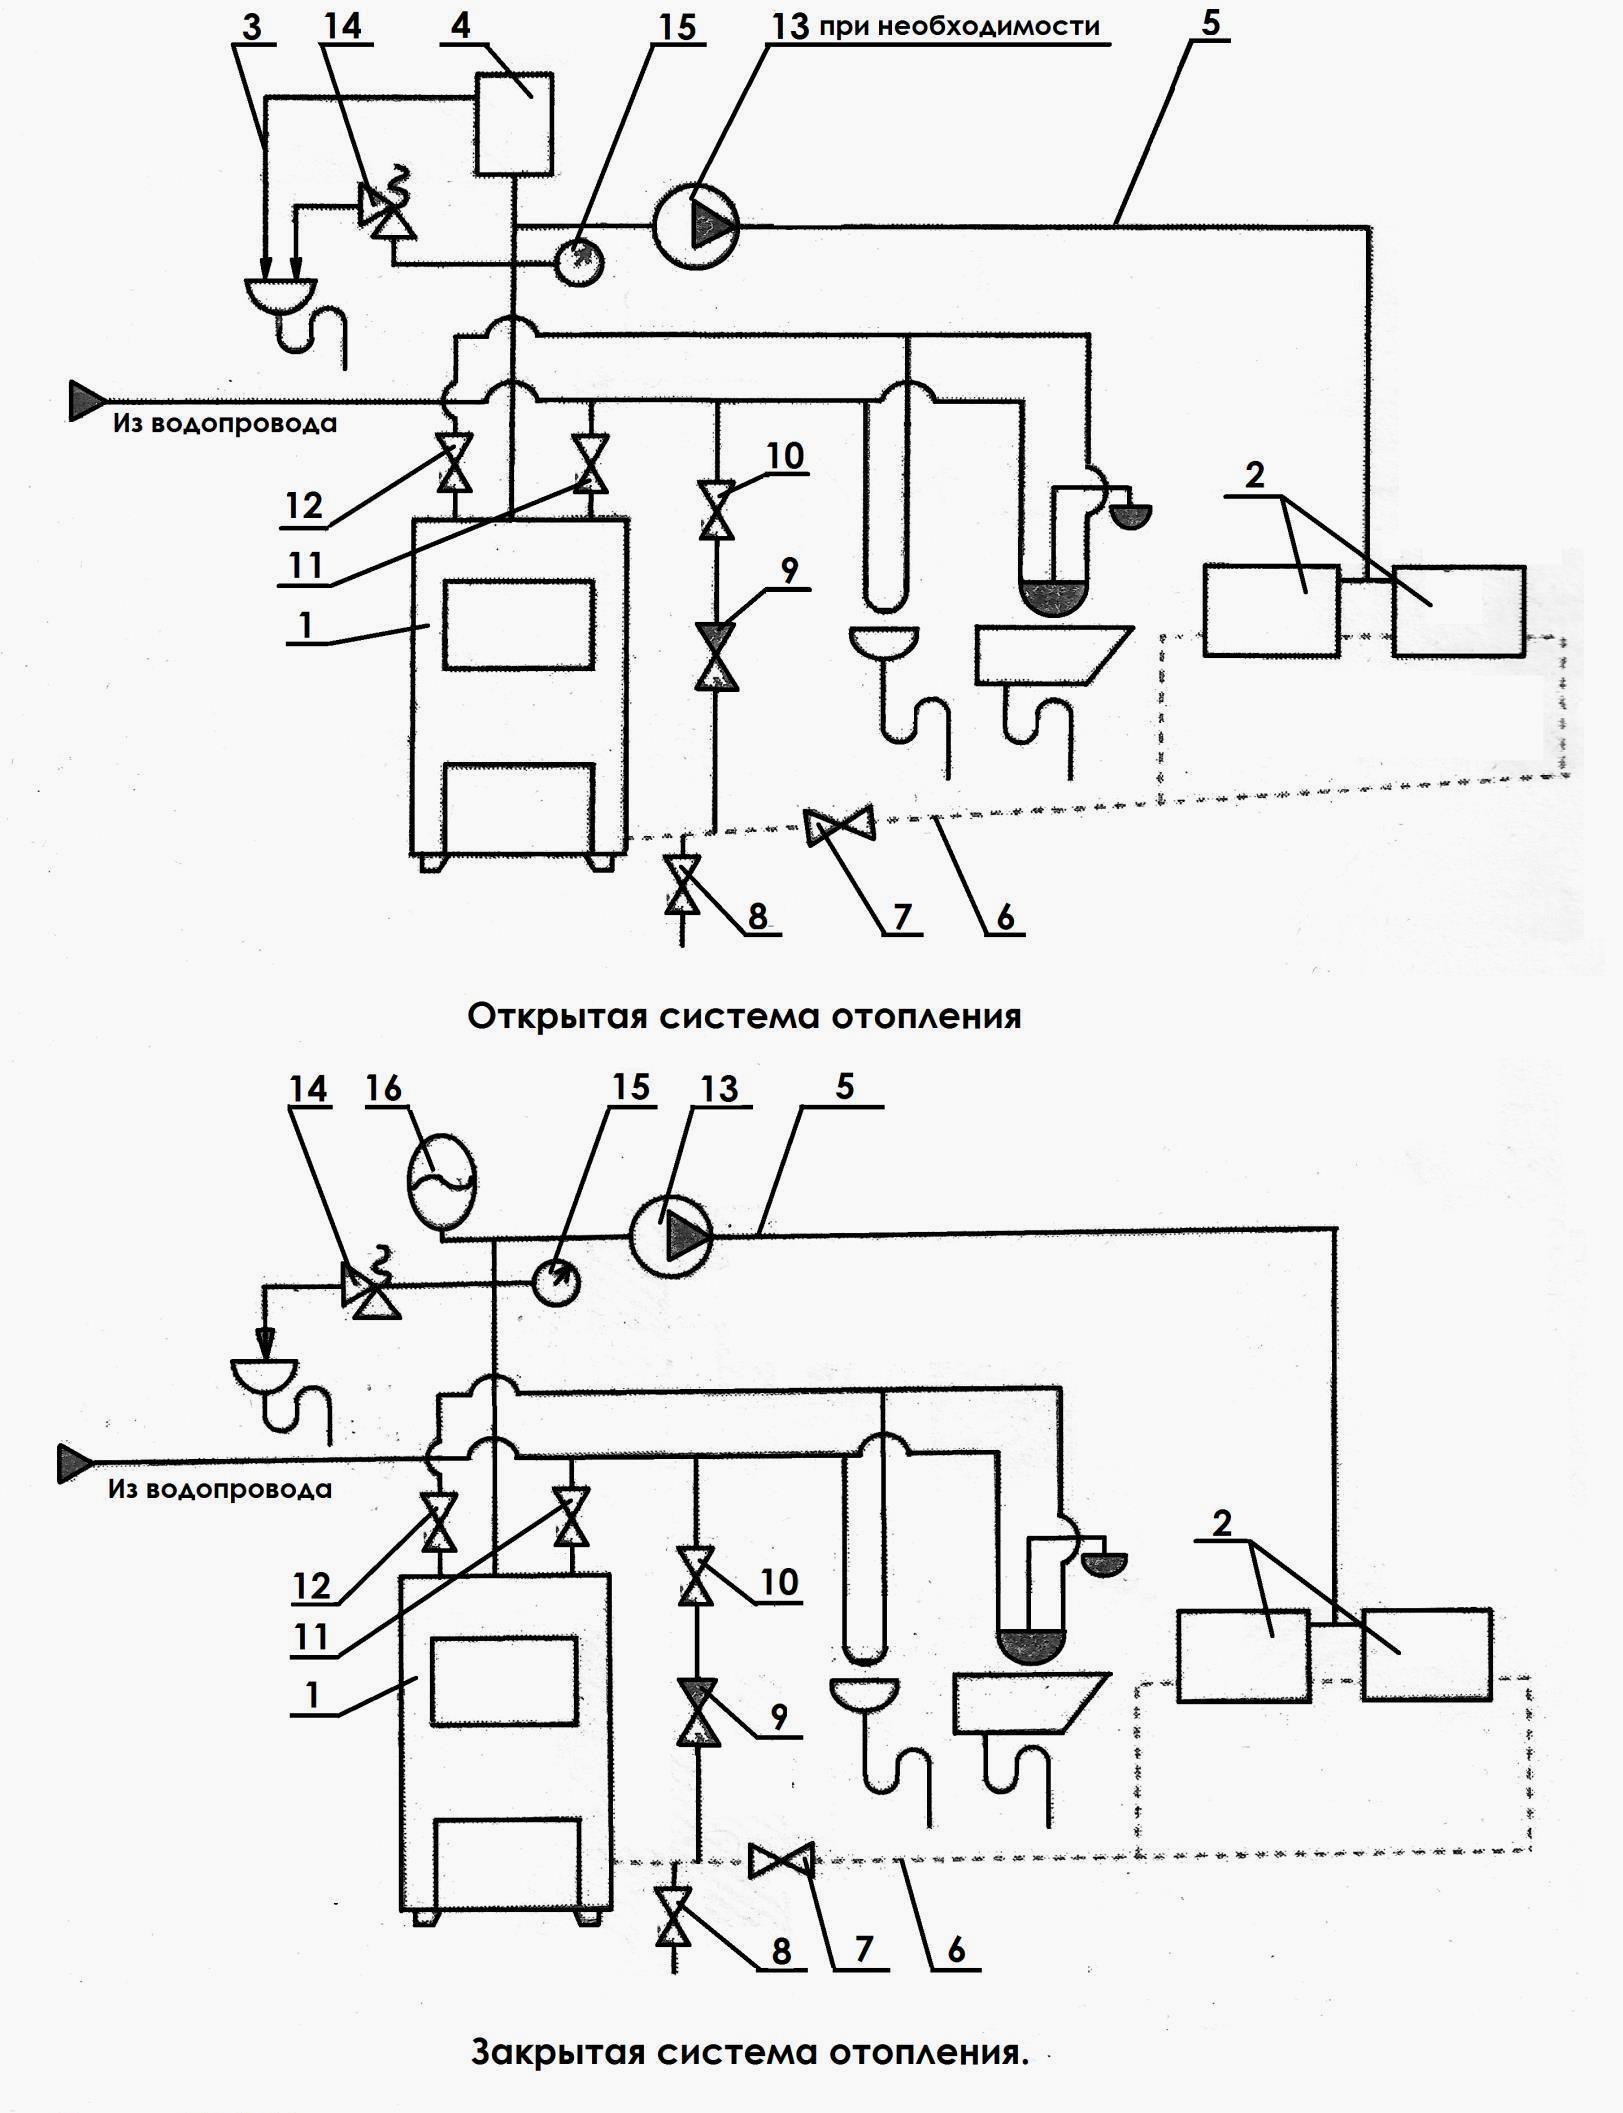 Схема подключения разъема прицепа (распиновка розетки.